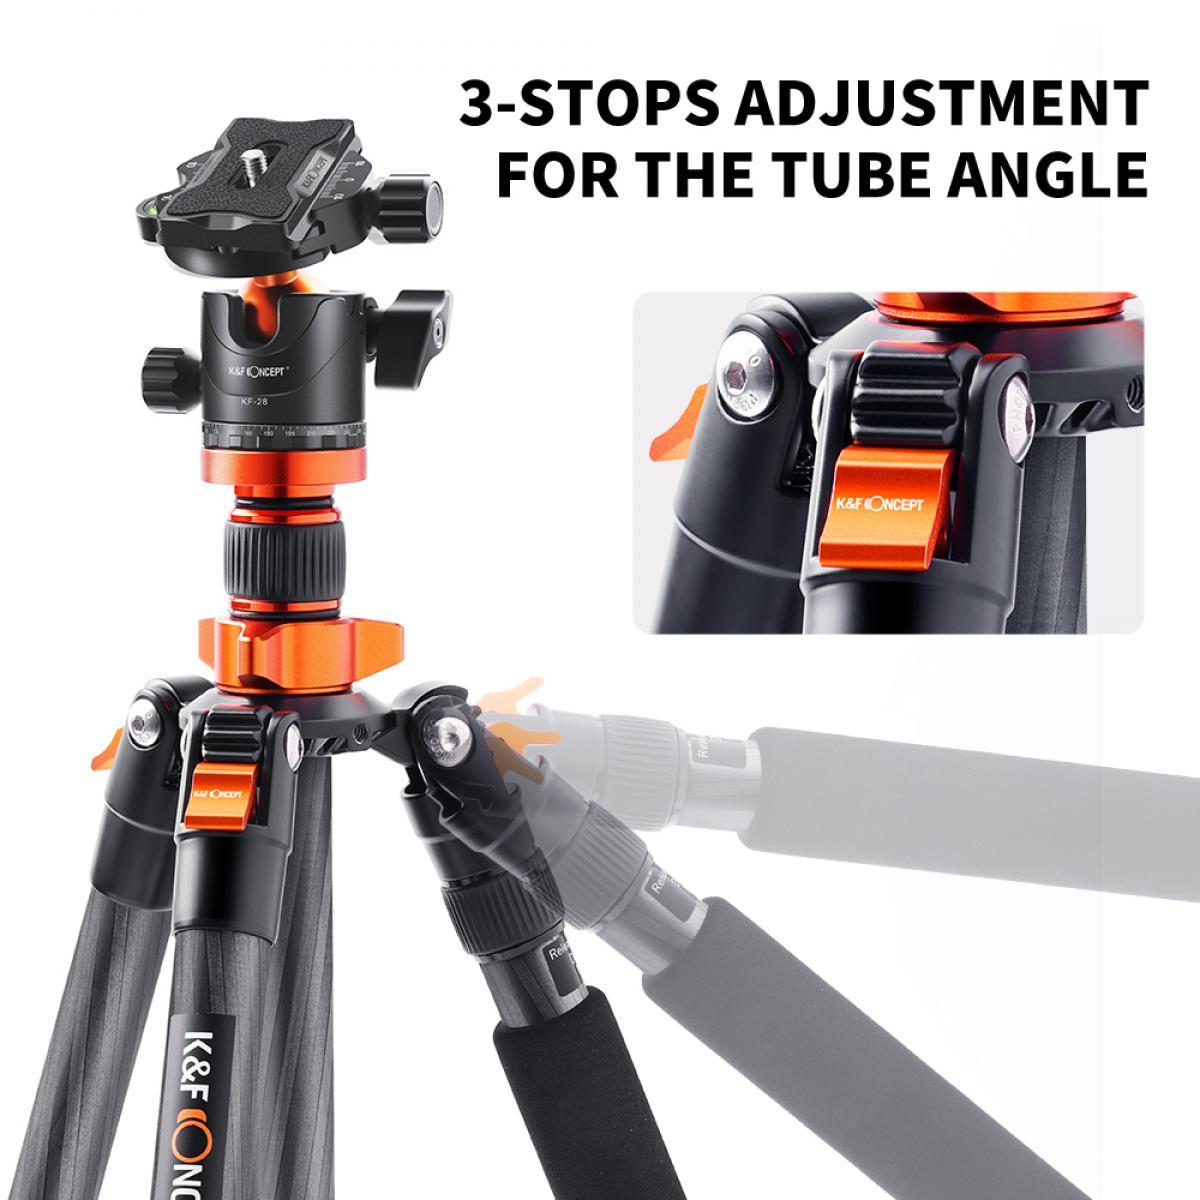 K&F SA255C1 Kohlefaser Stativ 172cm Carbon Kamerastativ, Kompaktes, Leichtes Reisestativ mit 360 Grad Kugelkopf